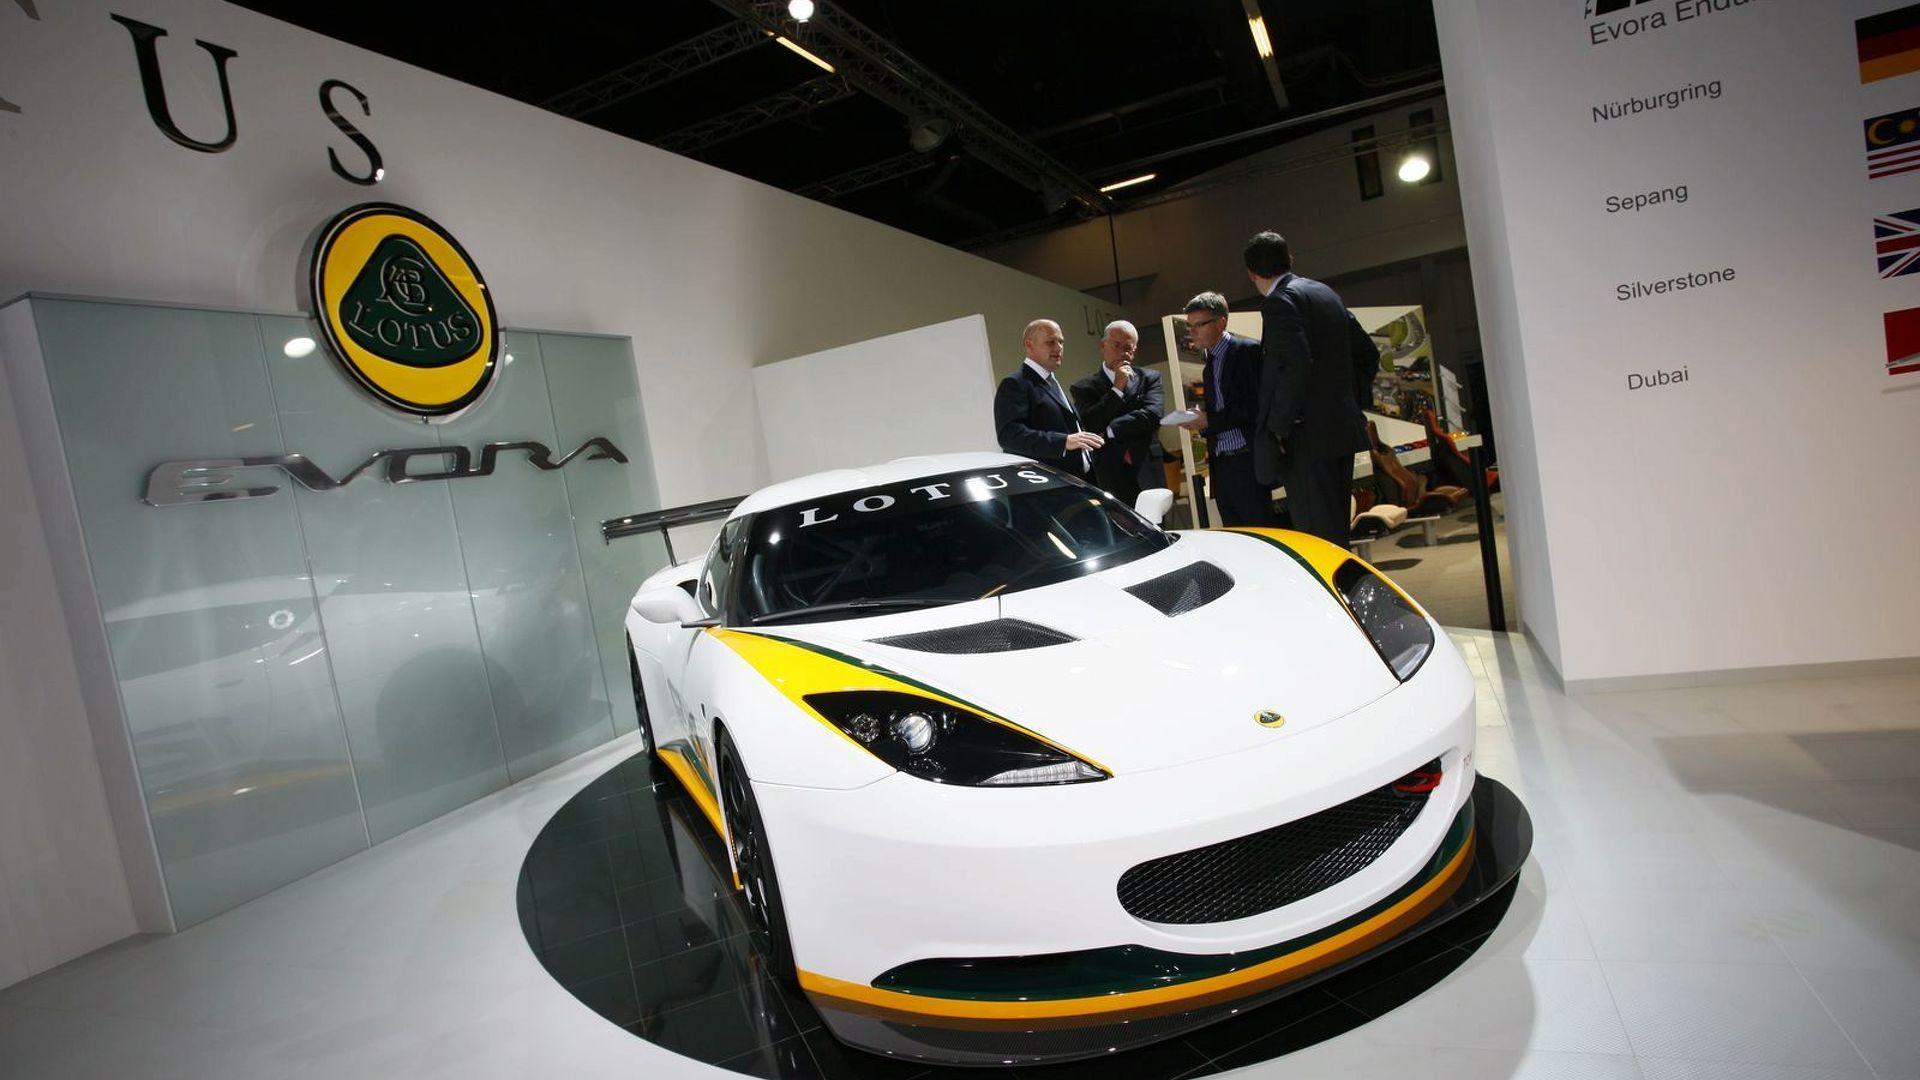 https://icdn-3.motor1.com/images/mgl/xZl7q/s1/2009-182545-lotus-evora-type-124-endurance-racecar-in-frankfurt1.jpg